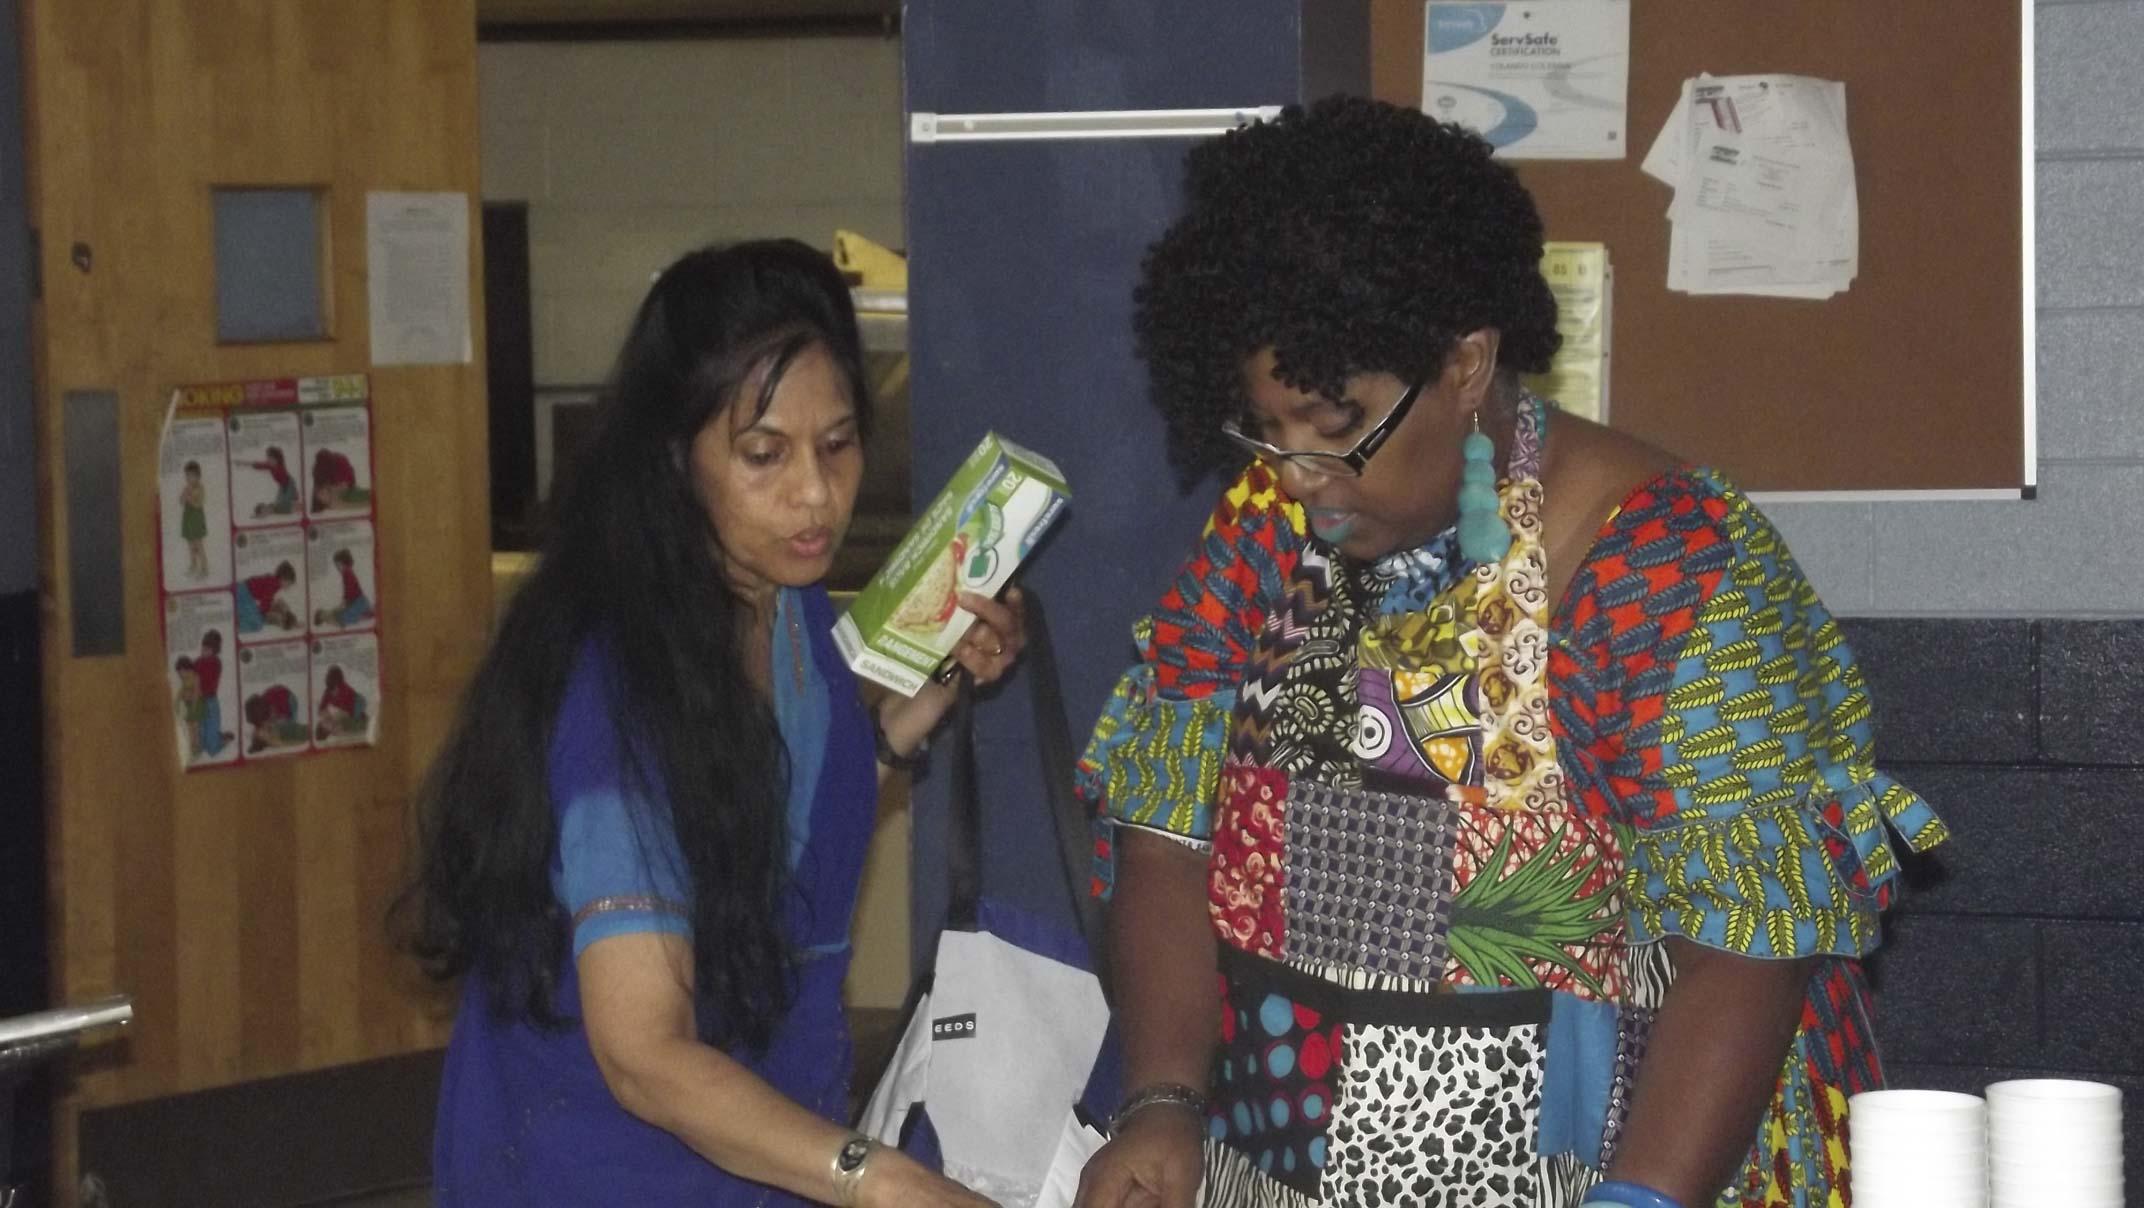 web Barankitse 2019Asike_African_Sisters_Information_Knowledge_Education_Fundraiser_2017_004web